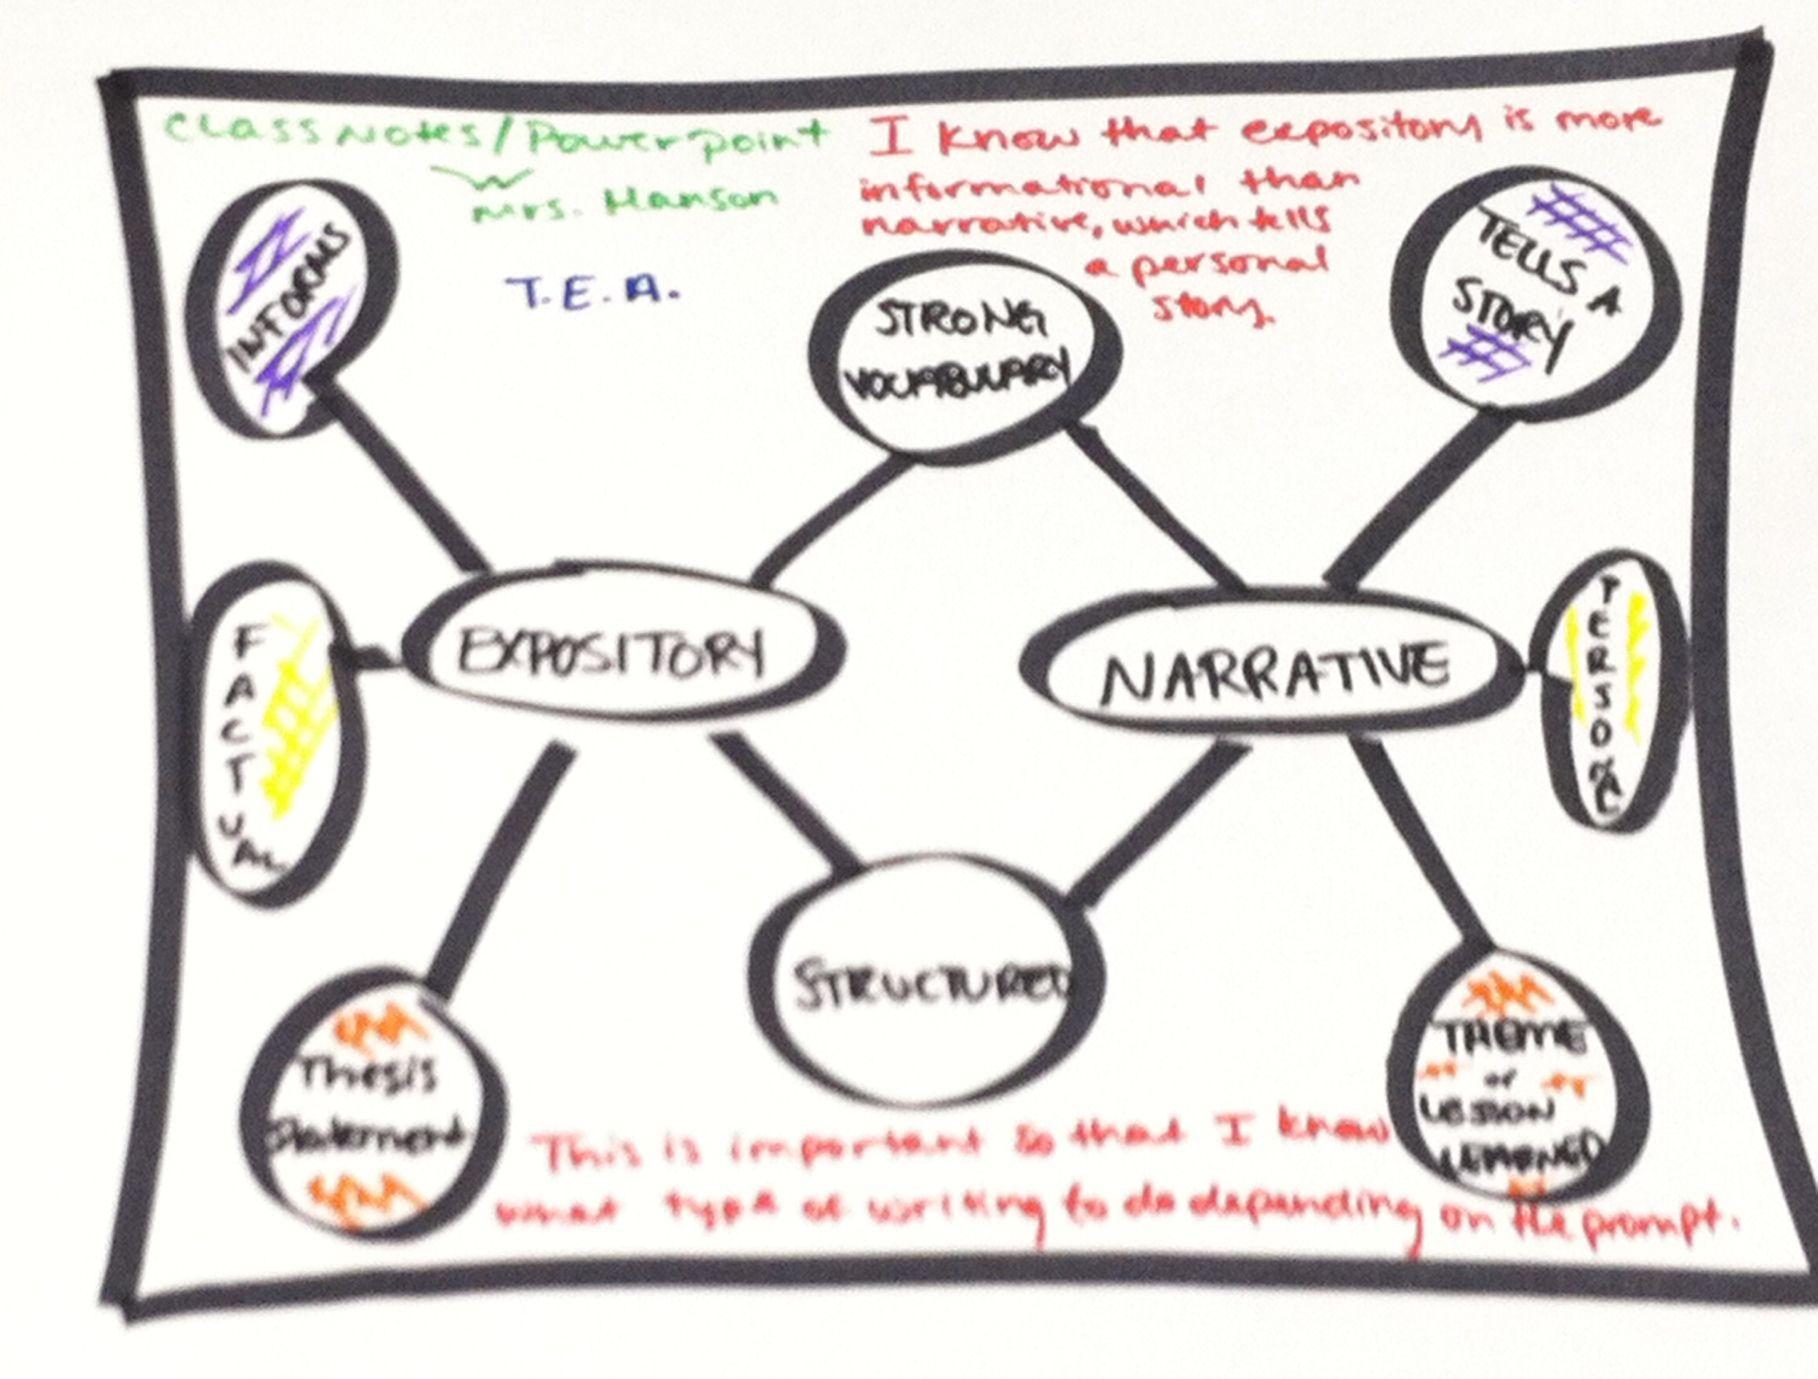 Narrative Vs Expository Double Bubble Thinking Map